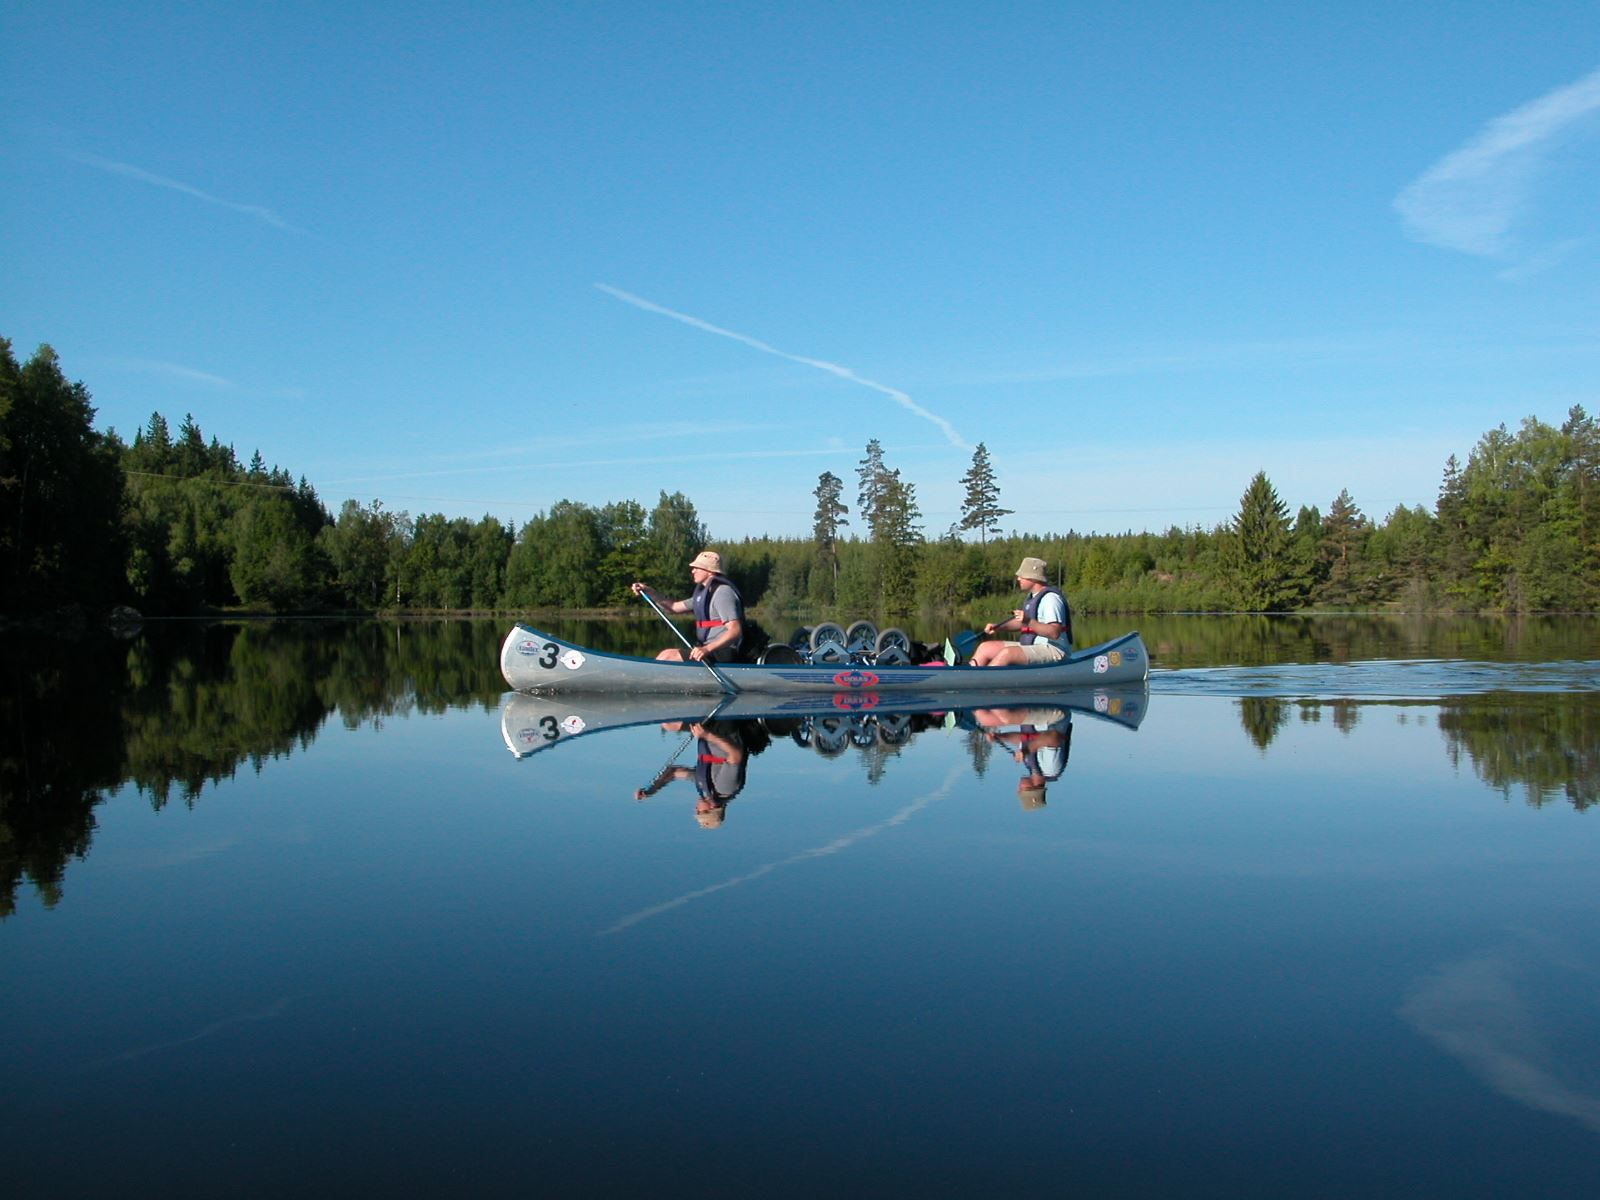 Hyr kanot timmar (minst 2), heldag